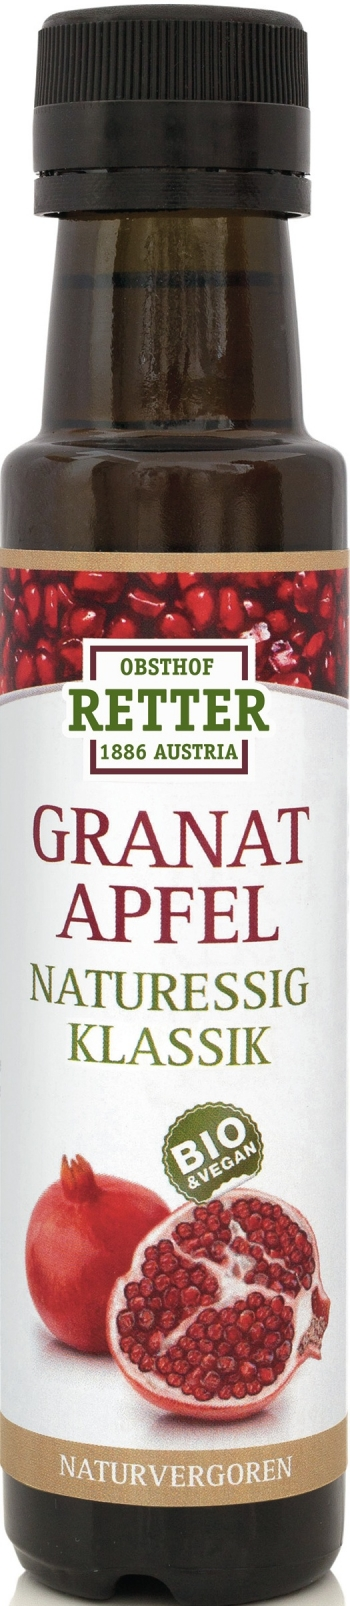 Granatapfel BIO Naturessig, 250ml, Retter